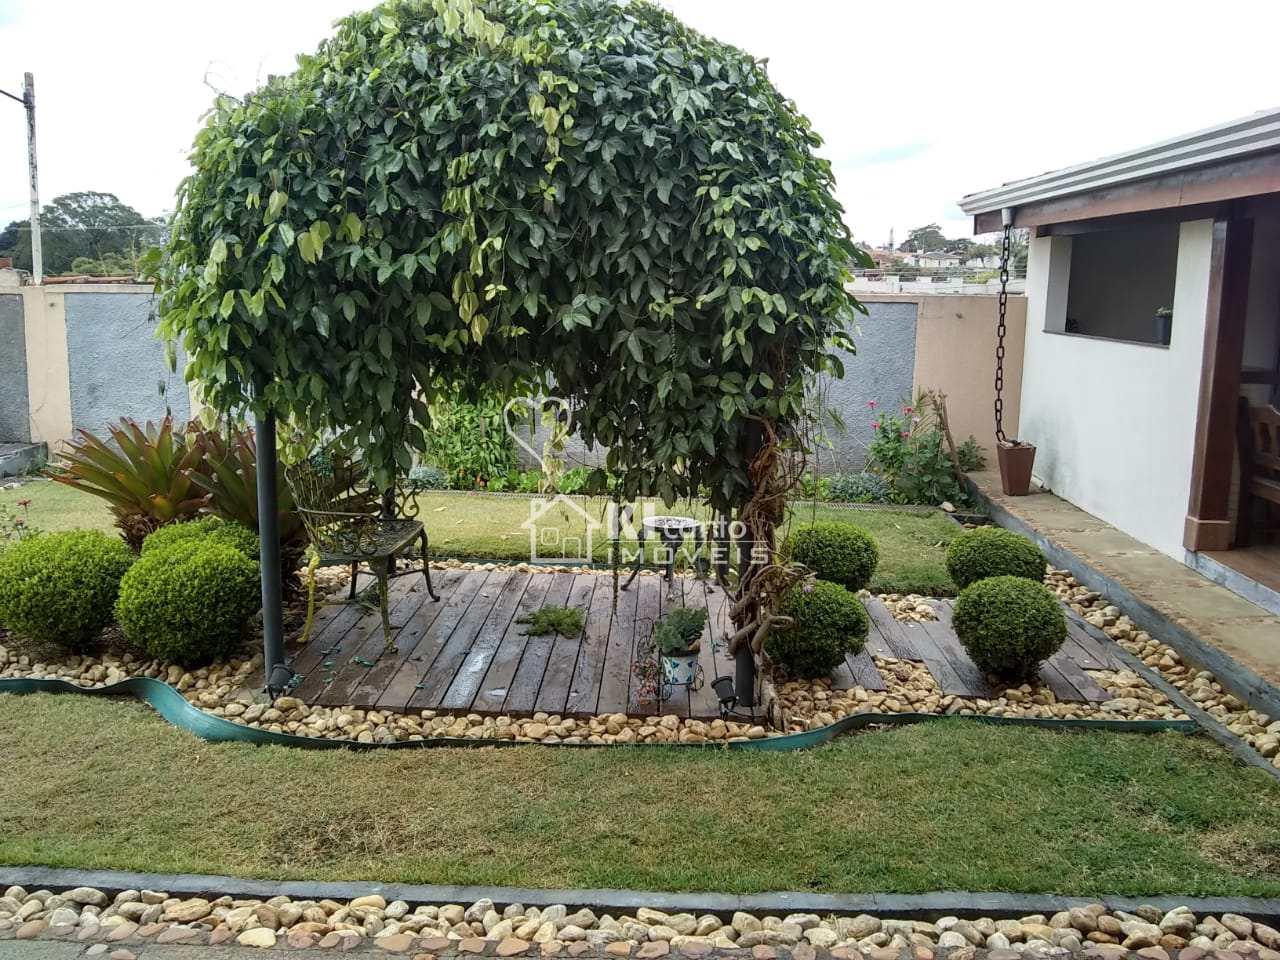 Sobrado com 4 dorms, Jardim Tapajós, Atibaia - R$ 1.3 mi, Cod: 118